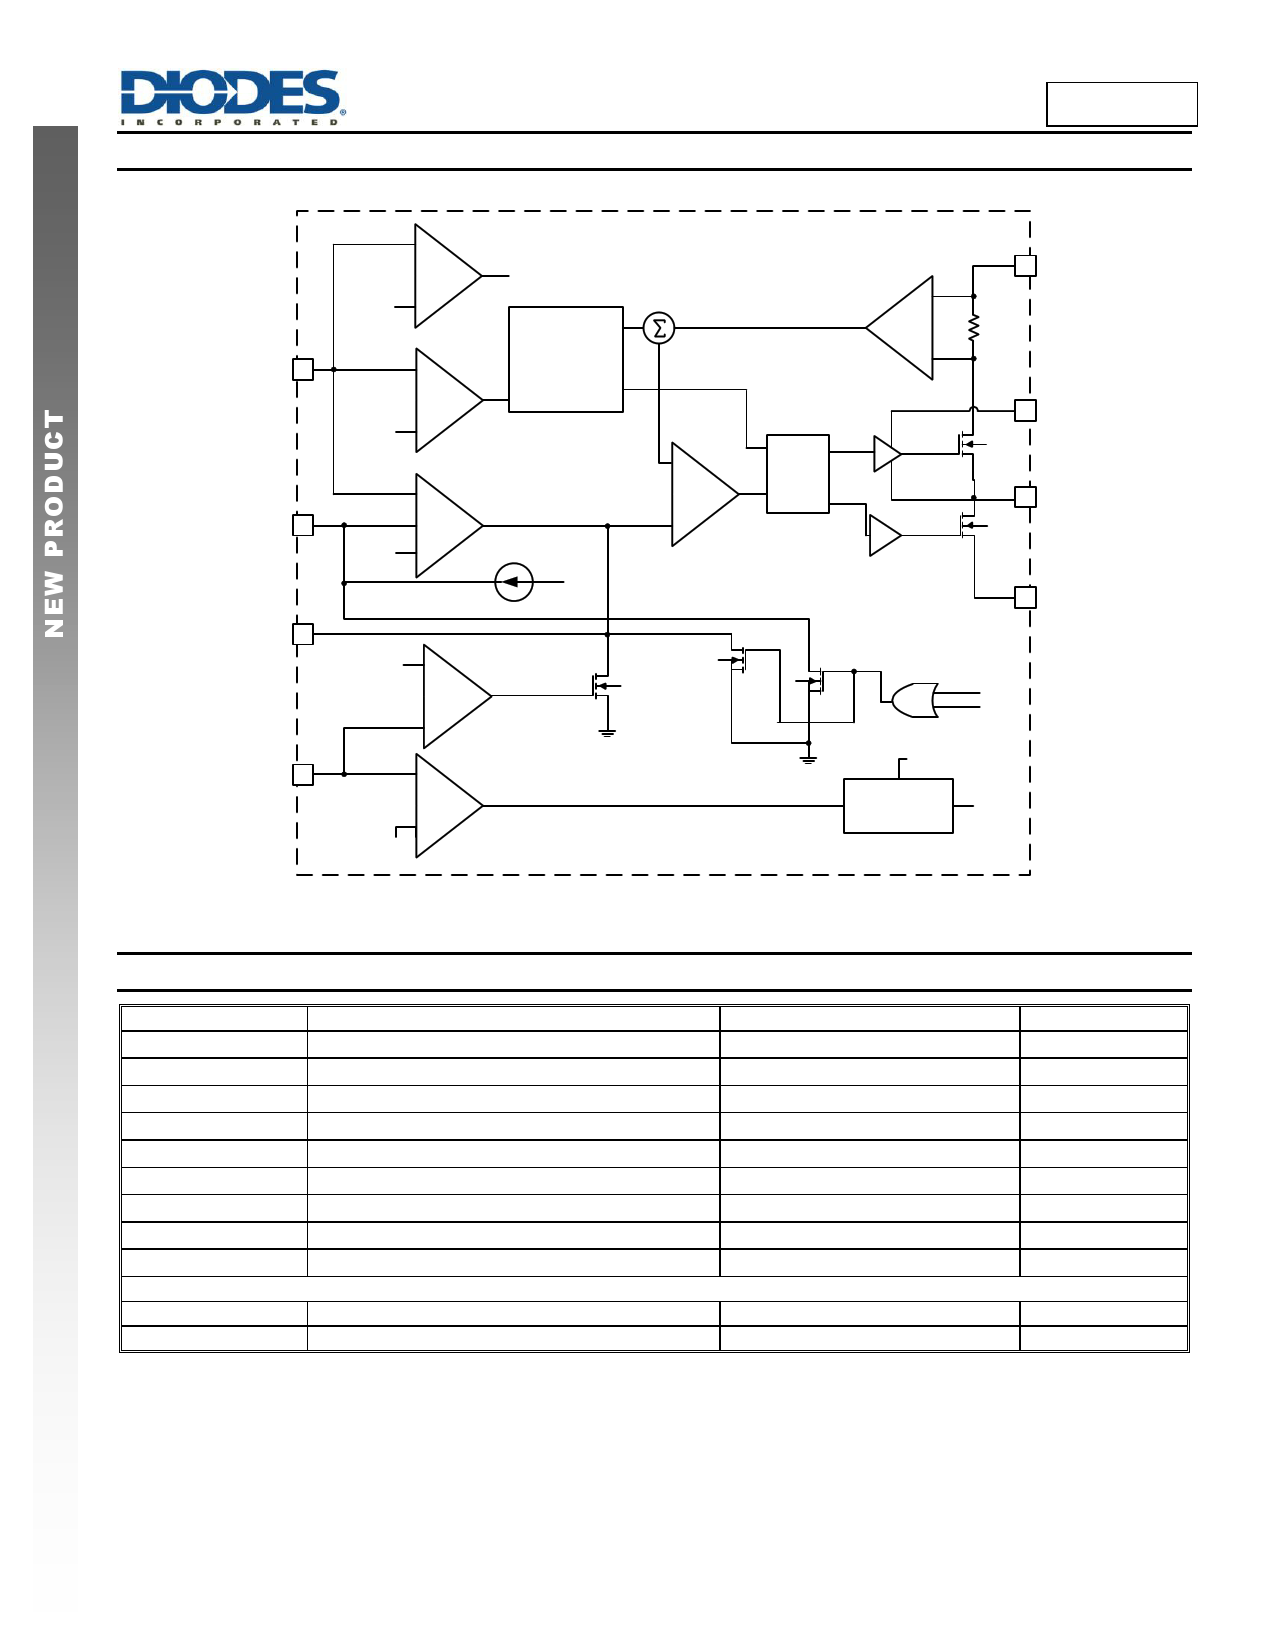 AP6503A pdf, 電子部品, 半導体, ピン配列